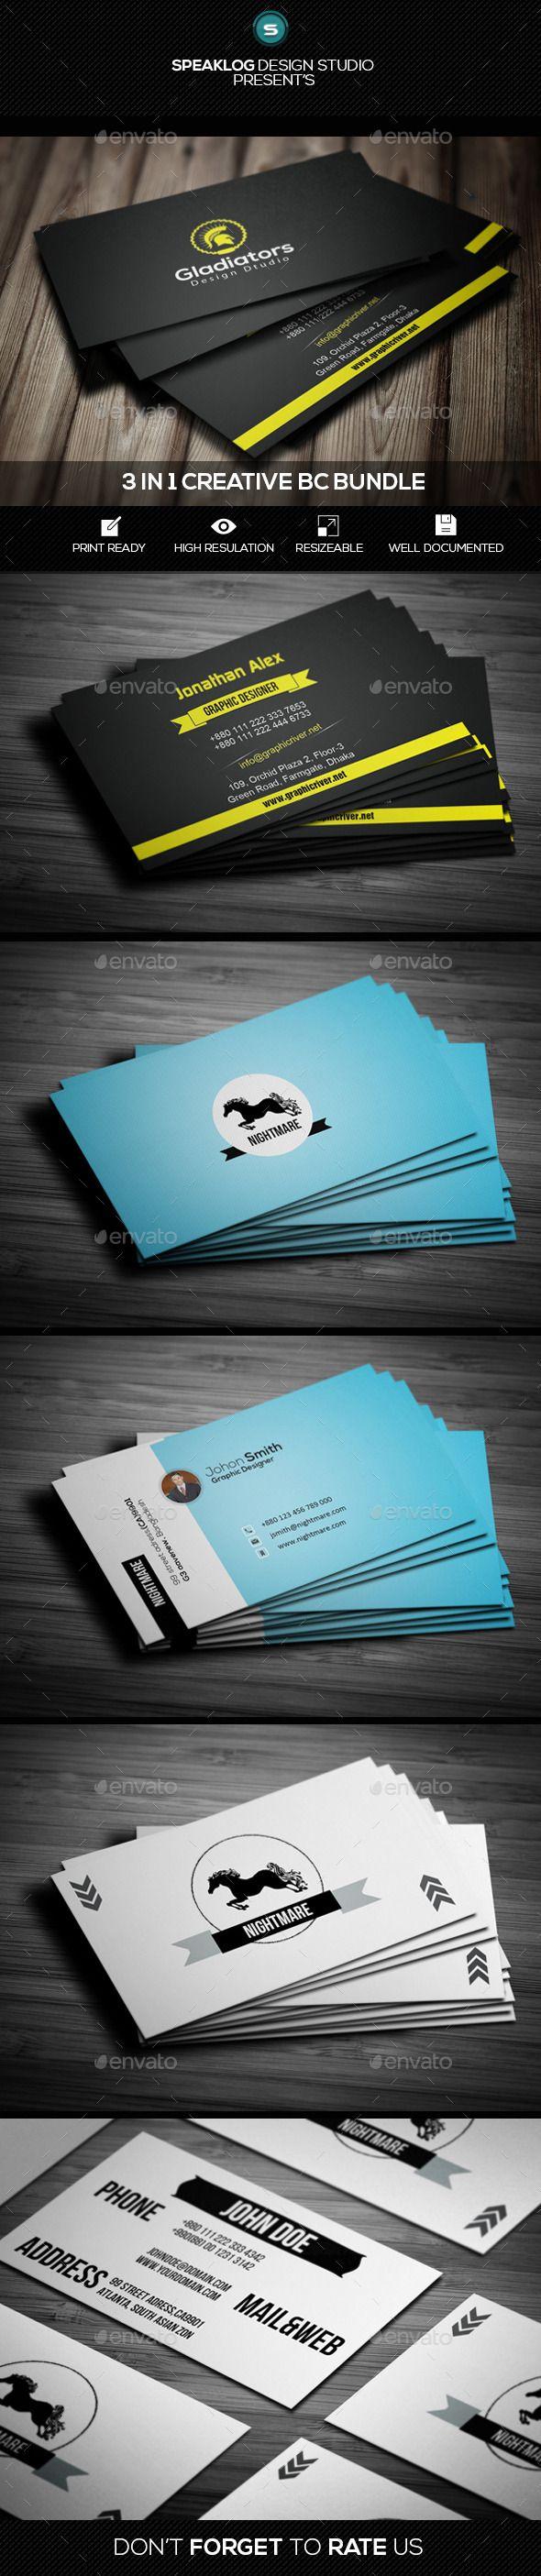 105 best business card images on pinterest business cards creative business card bundle creative business cards magicingreecefo Images